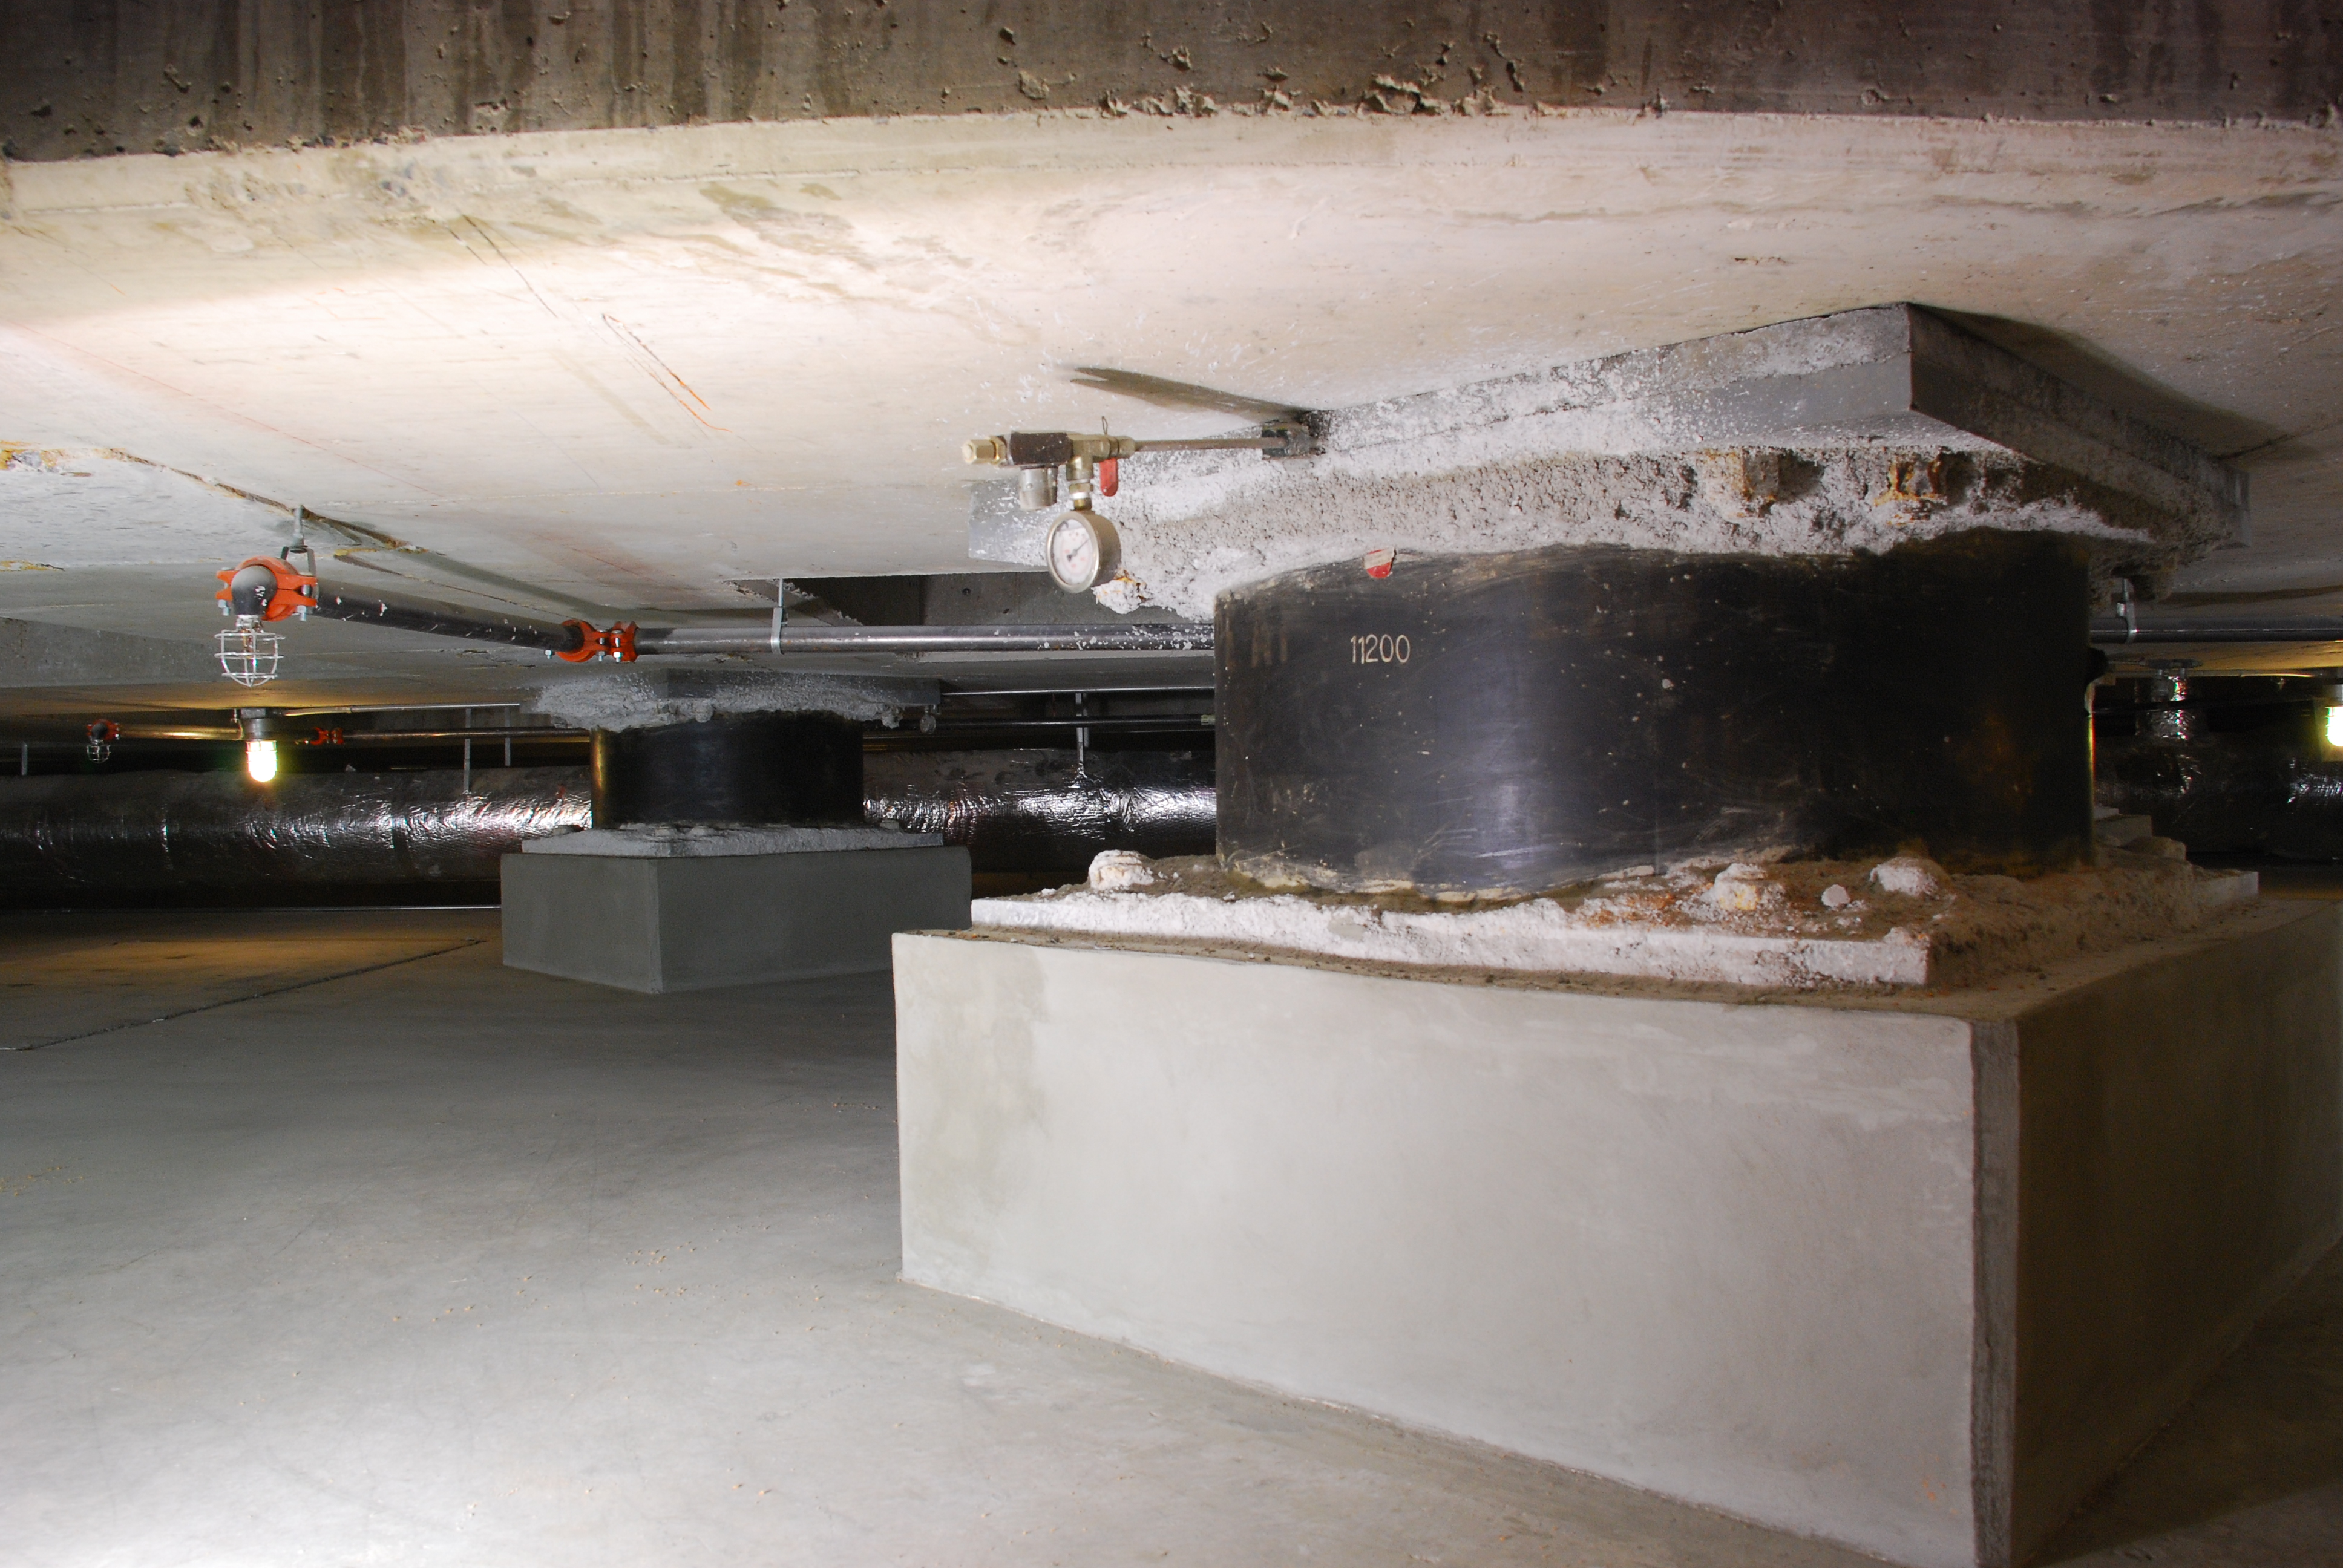 File:Base isolators under the Utah State Capitol.jpg - Wikimedia Commons